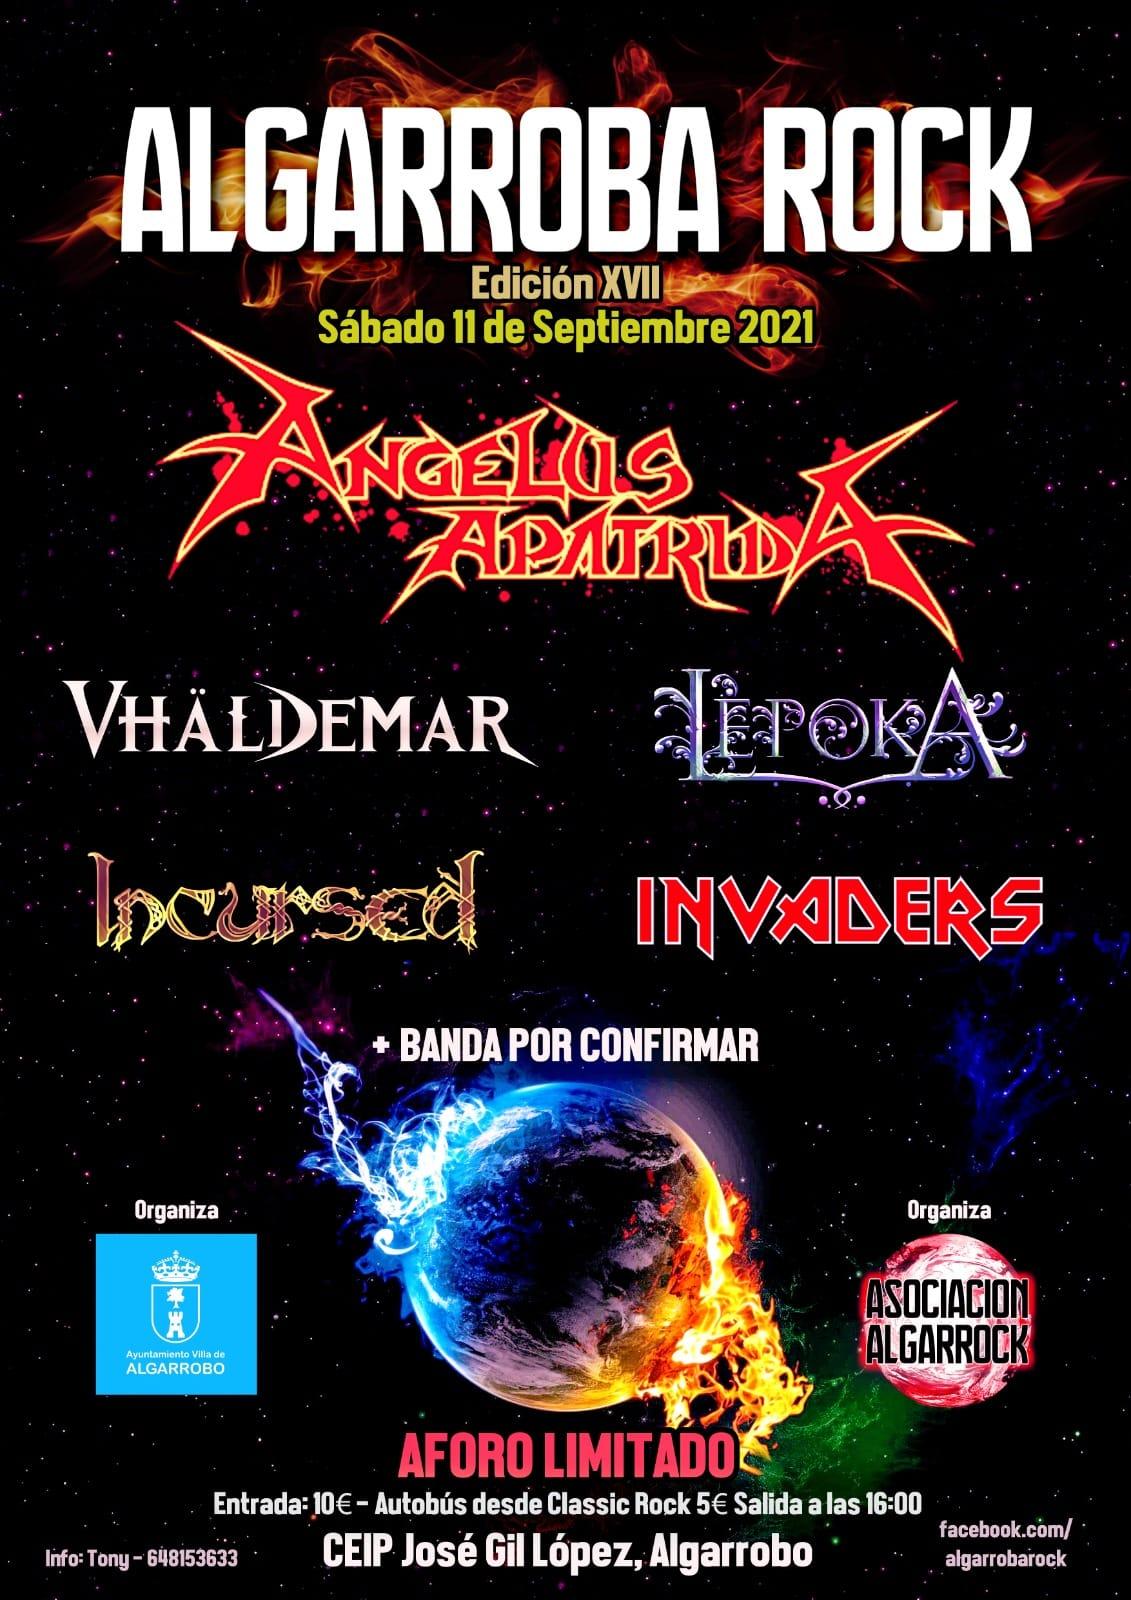 festival ALGARROBA ROCK XVII